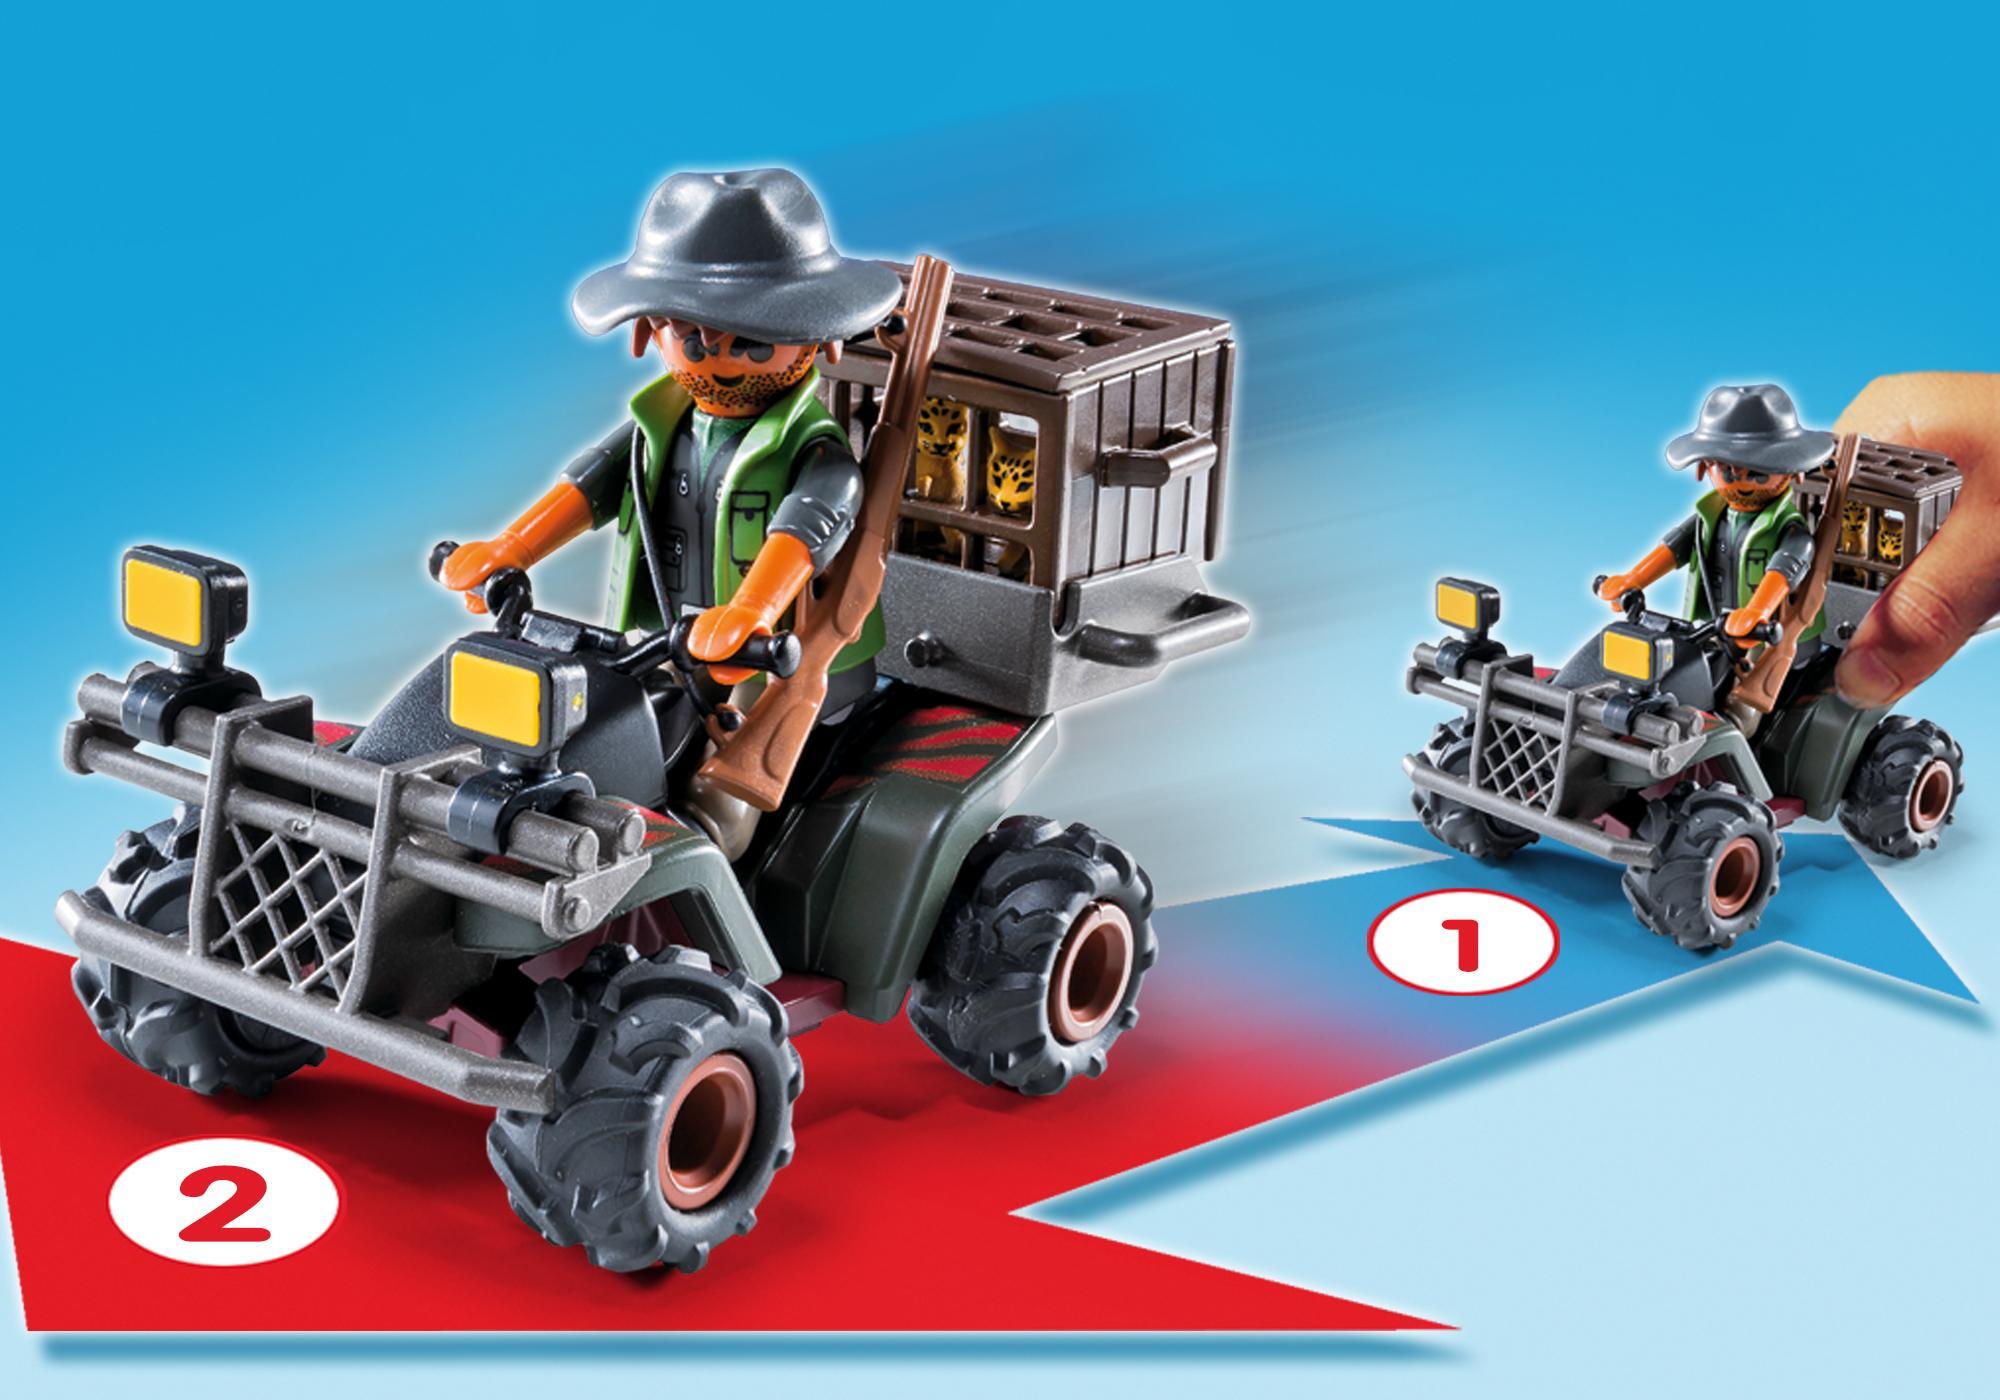 http://media.playmobil.com/i/playmobil/6939_product_extra1/Stroper met quad